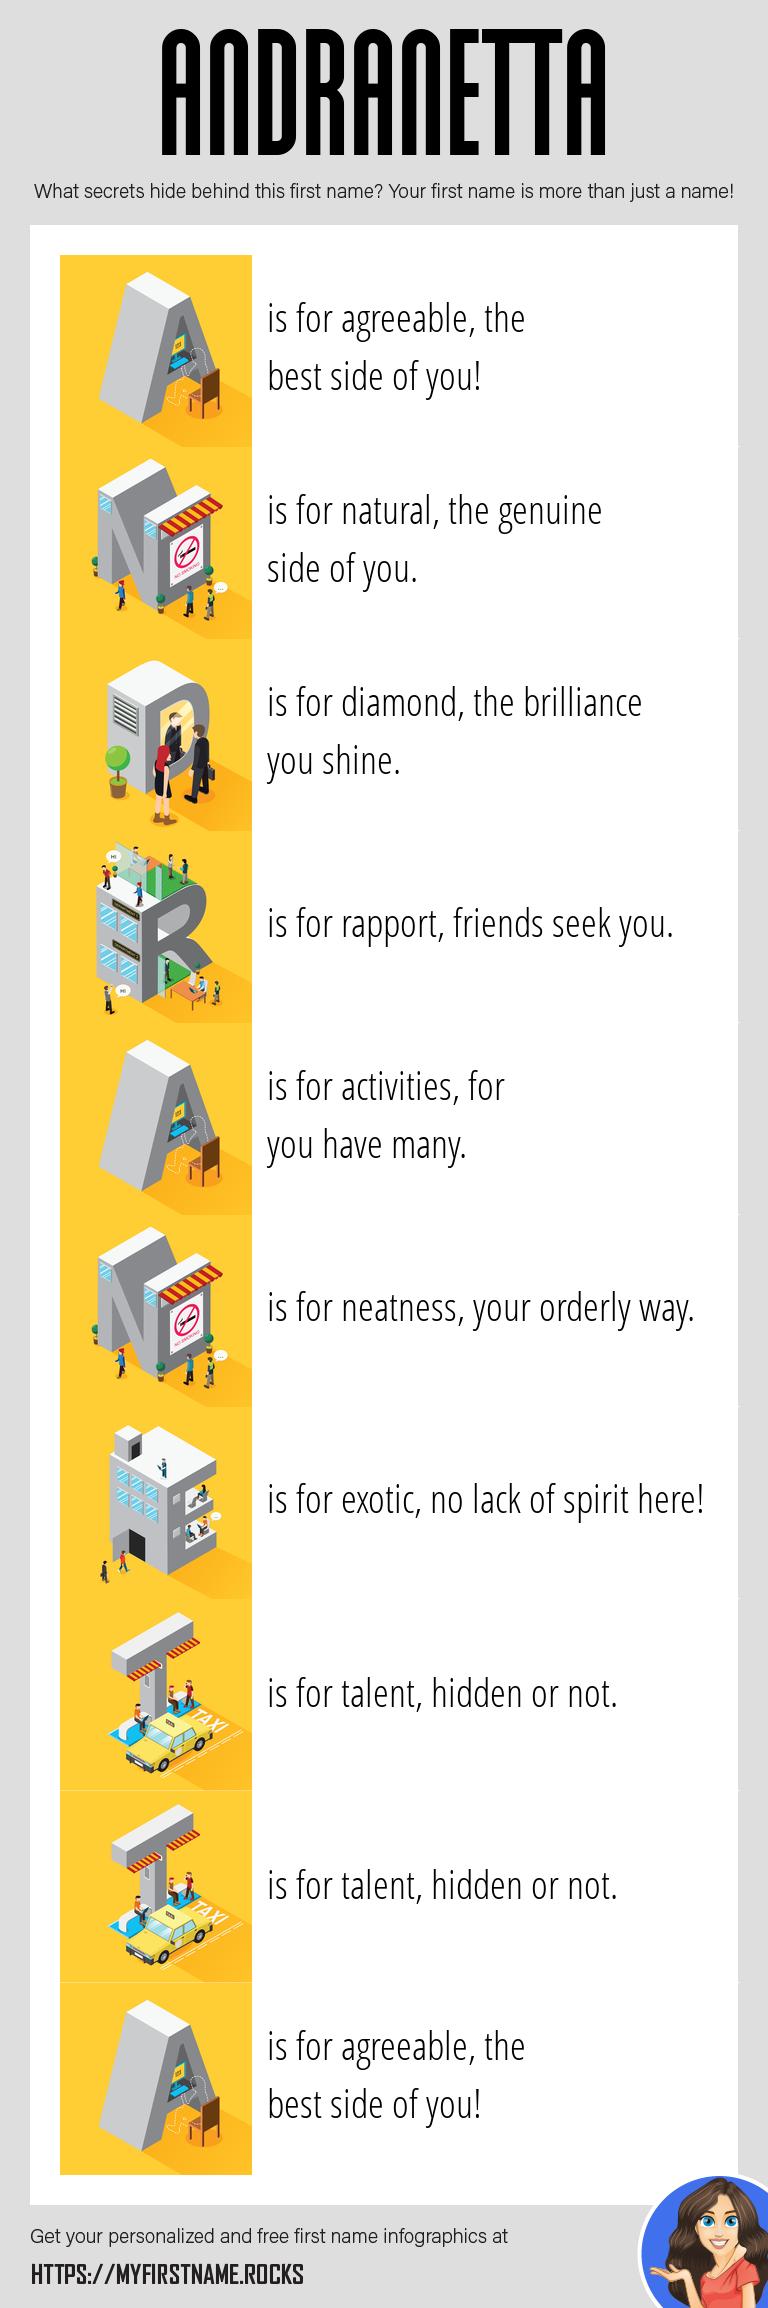 Andranetta Infographics